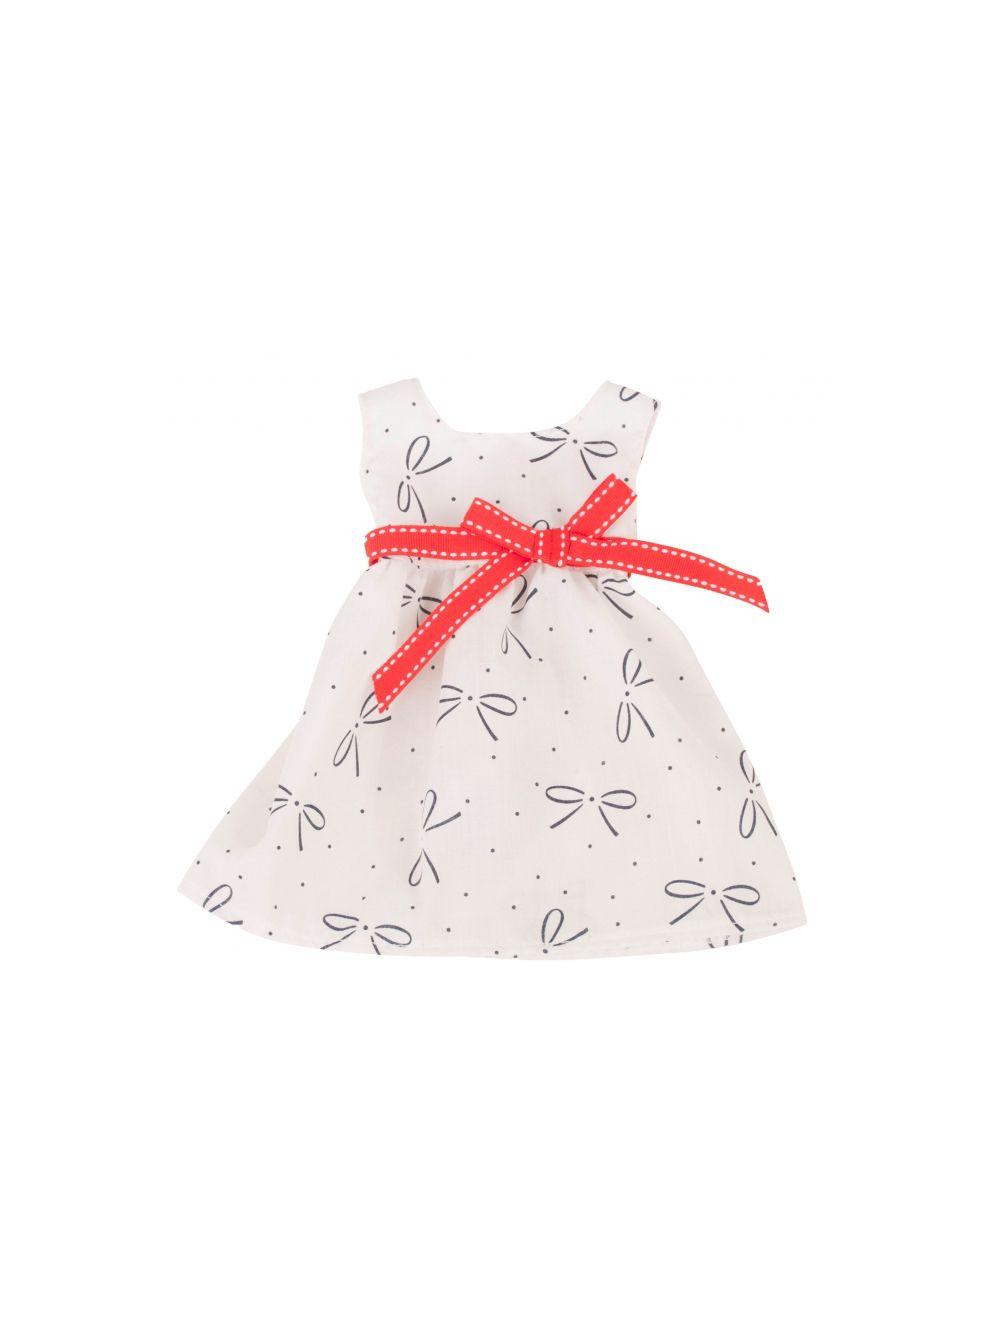 trükimustriline kleit 46-50 cm